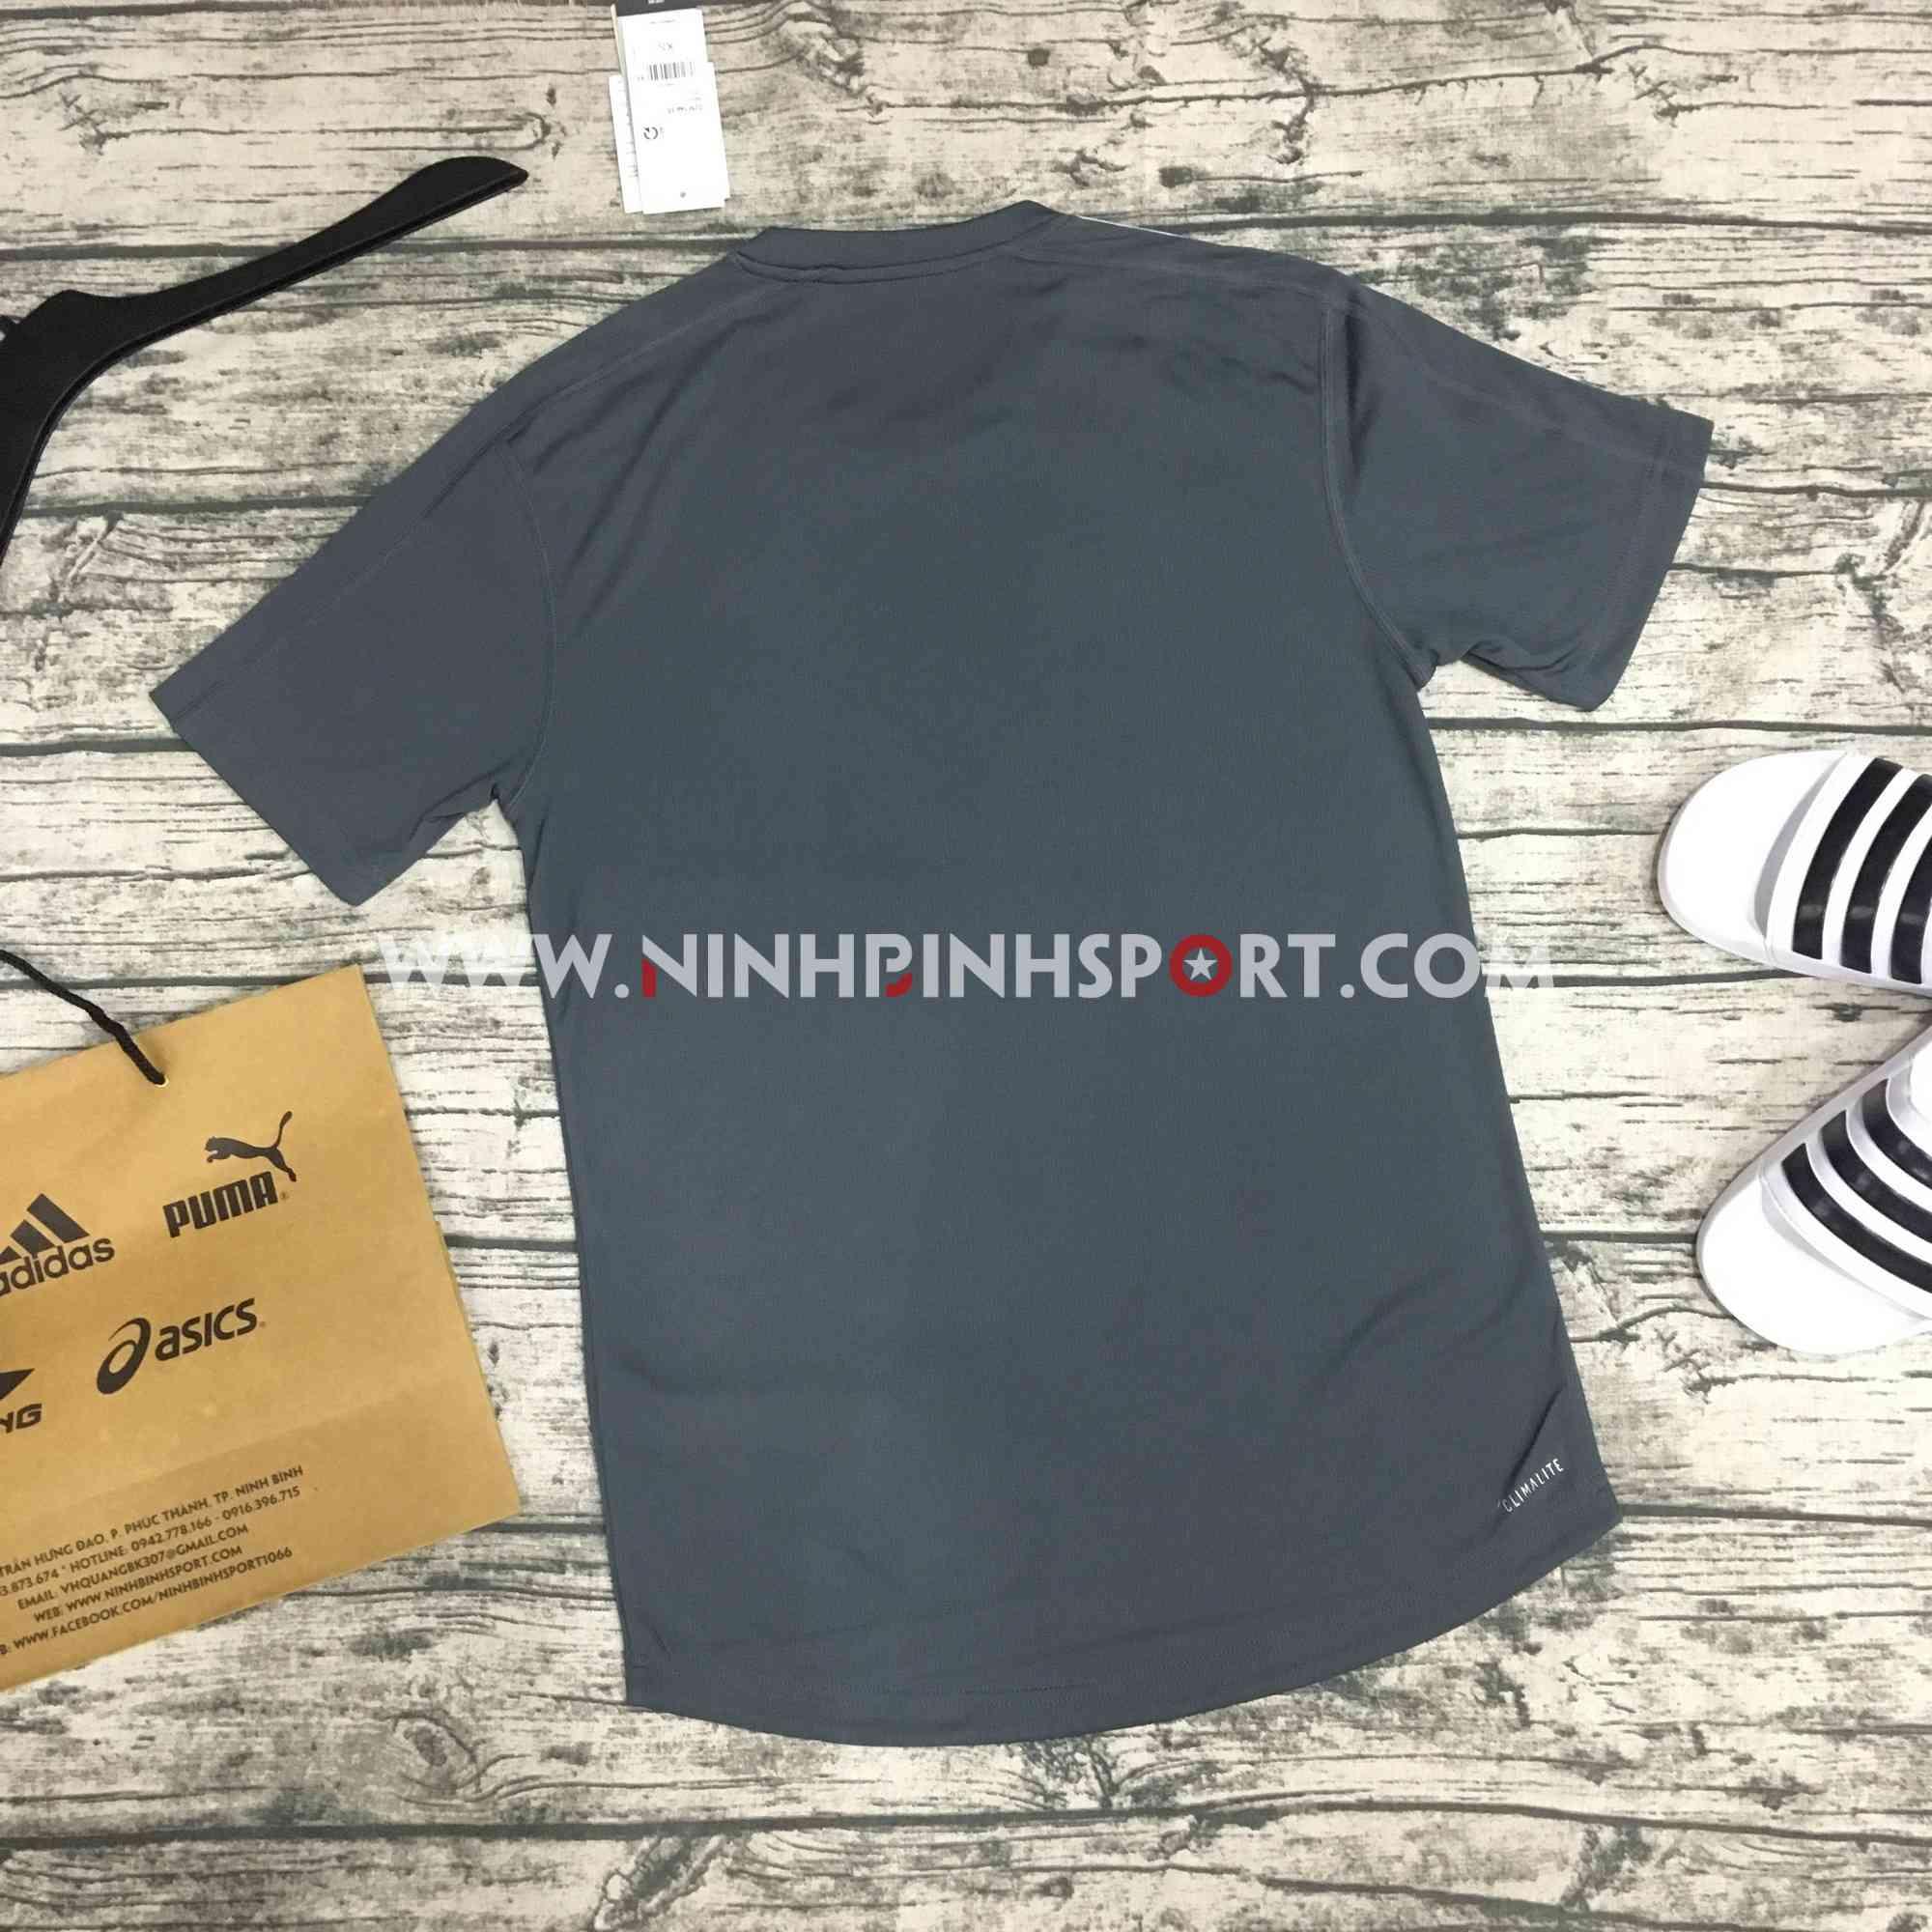 Áo thể thao nam Adidas Design 2 Move 3-Stripes Tee Grey DU1259